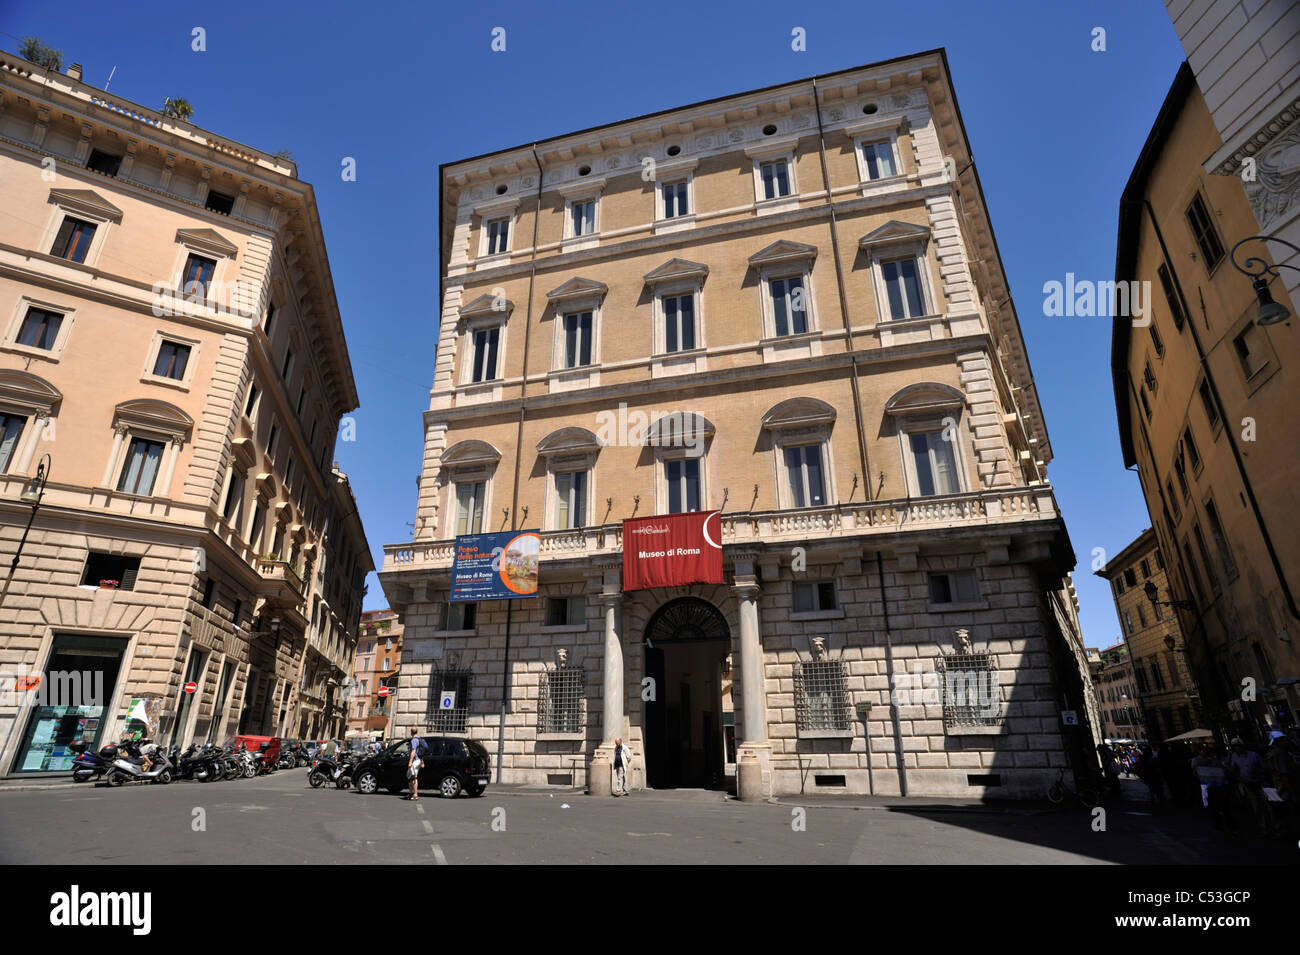 Museo Di Roma Stockfotos & Museo Di Roma Bilder - Alamy